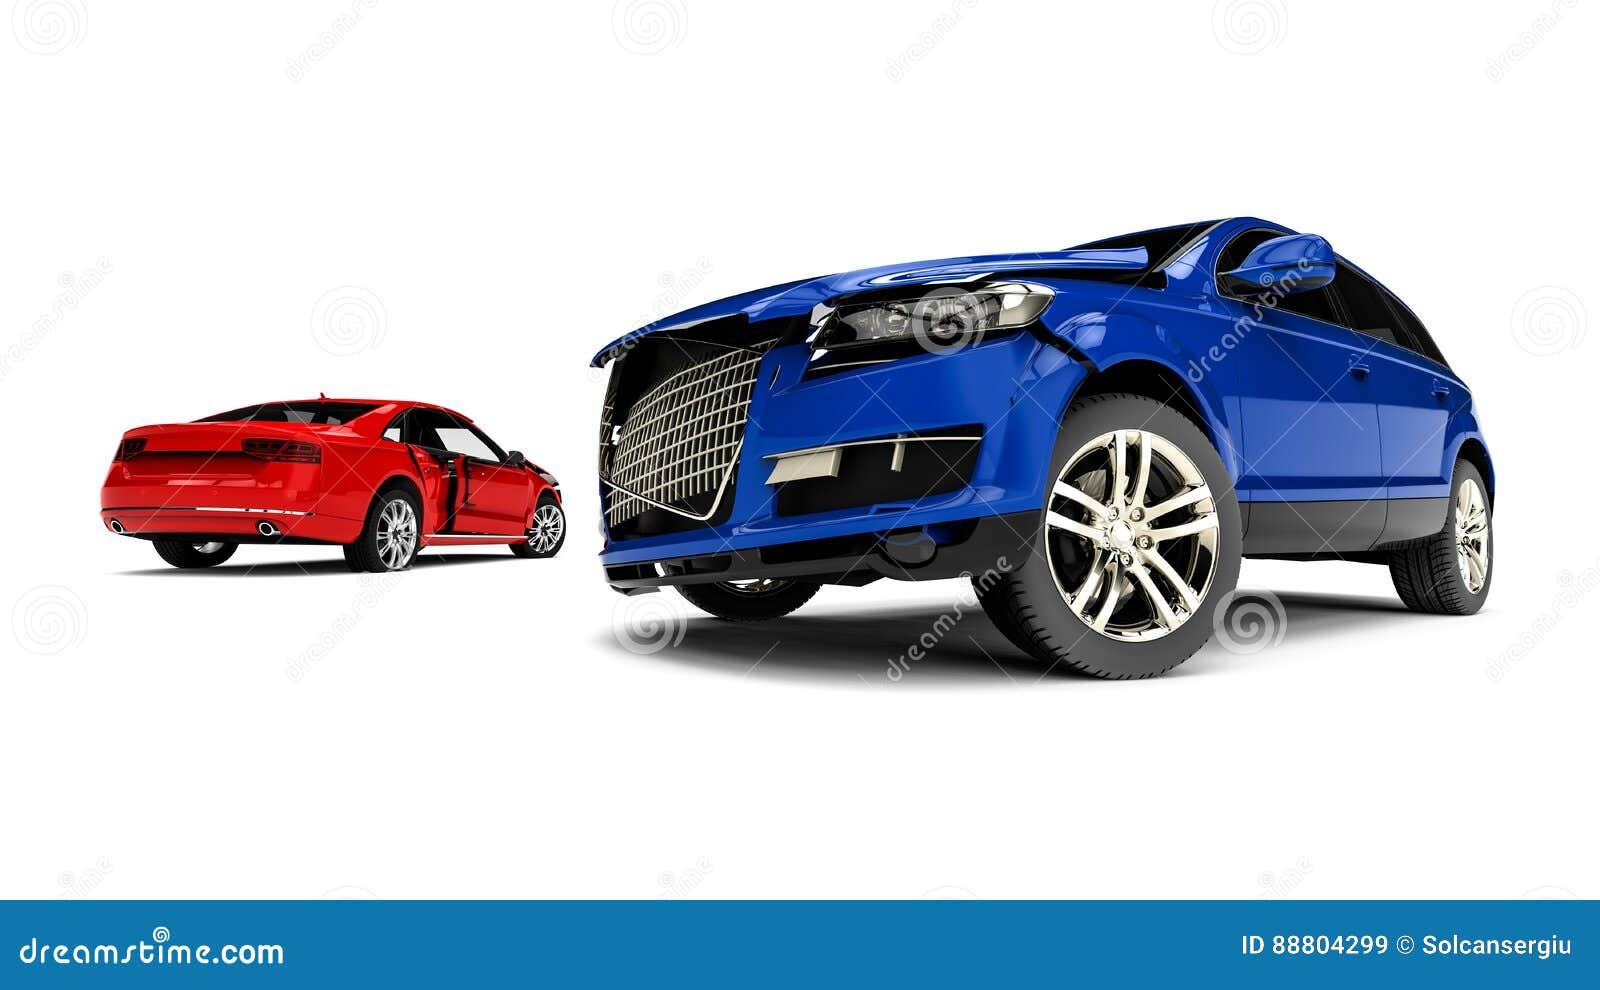 Wrecked Cars Stock Illustration Illustration Of Background 88804299